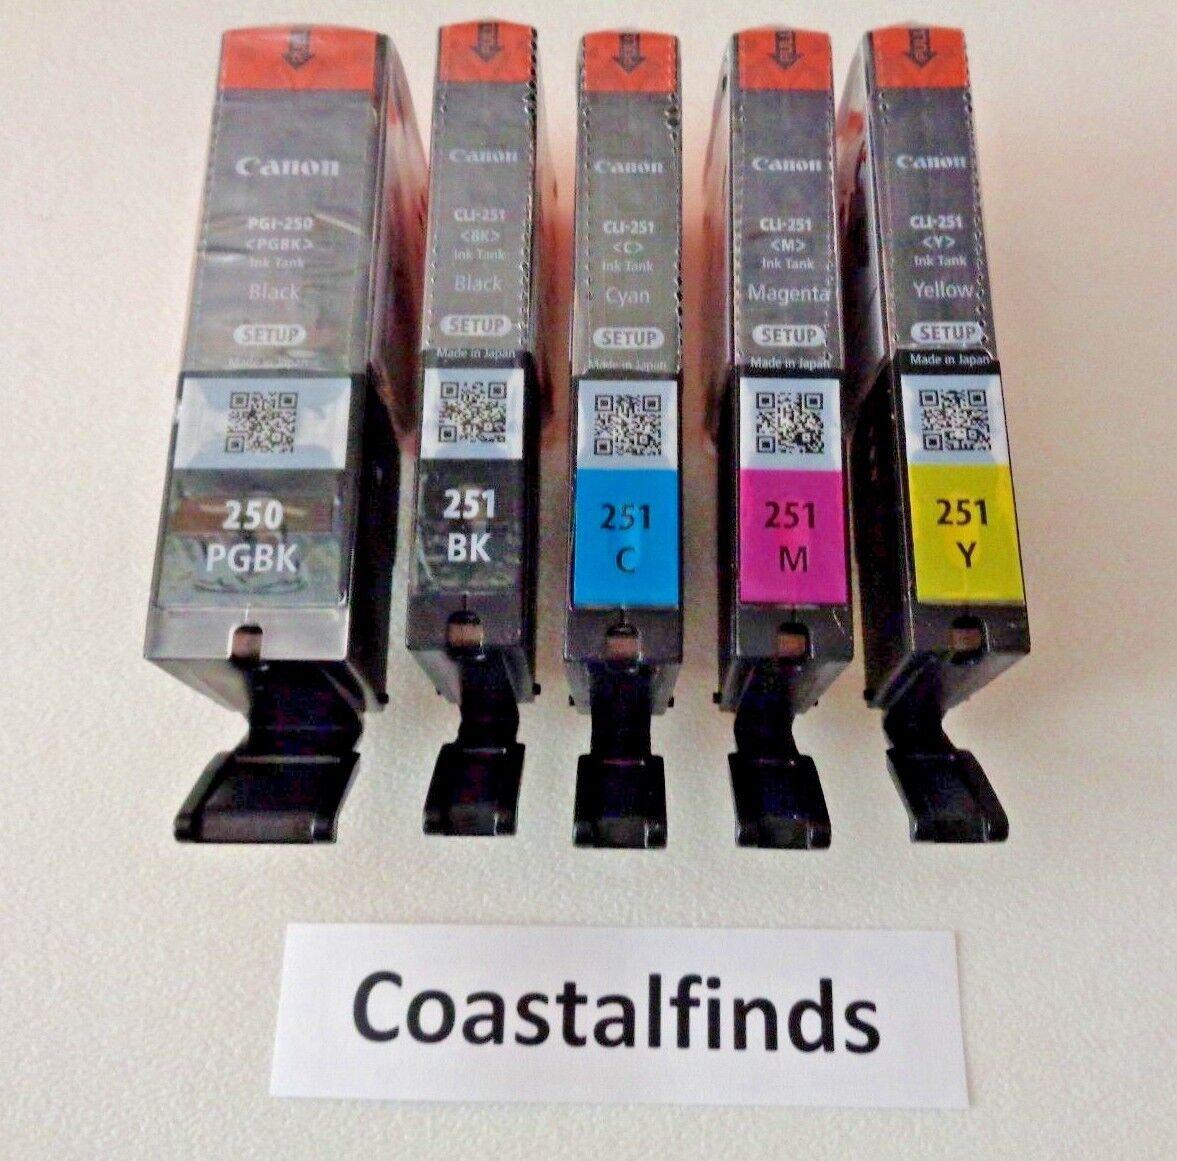 pgi 250 cli 251 ink cartridge set